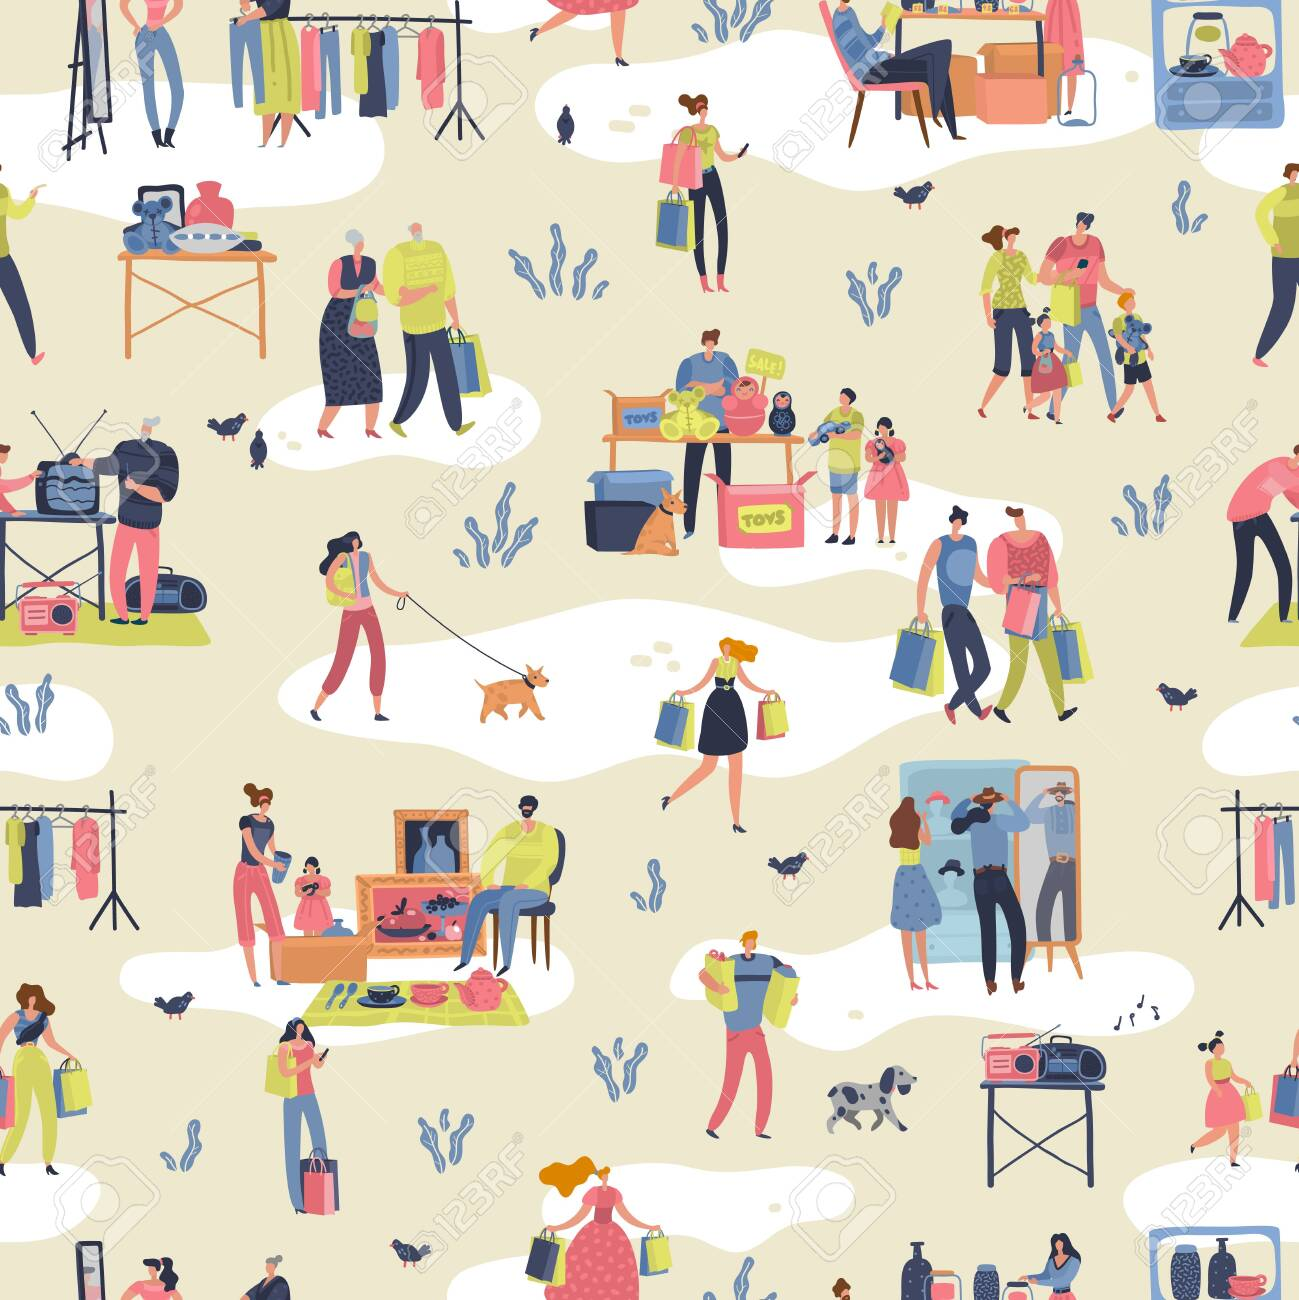 Flea market. People shopping second hand stylish goods clothes swap meet bazaar texture. Fleas market vector retro seamless pattern - 124405373